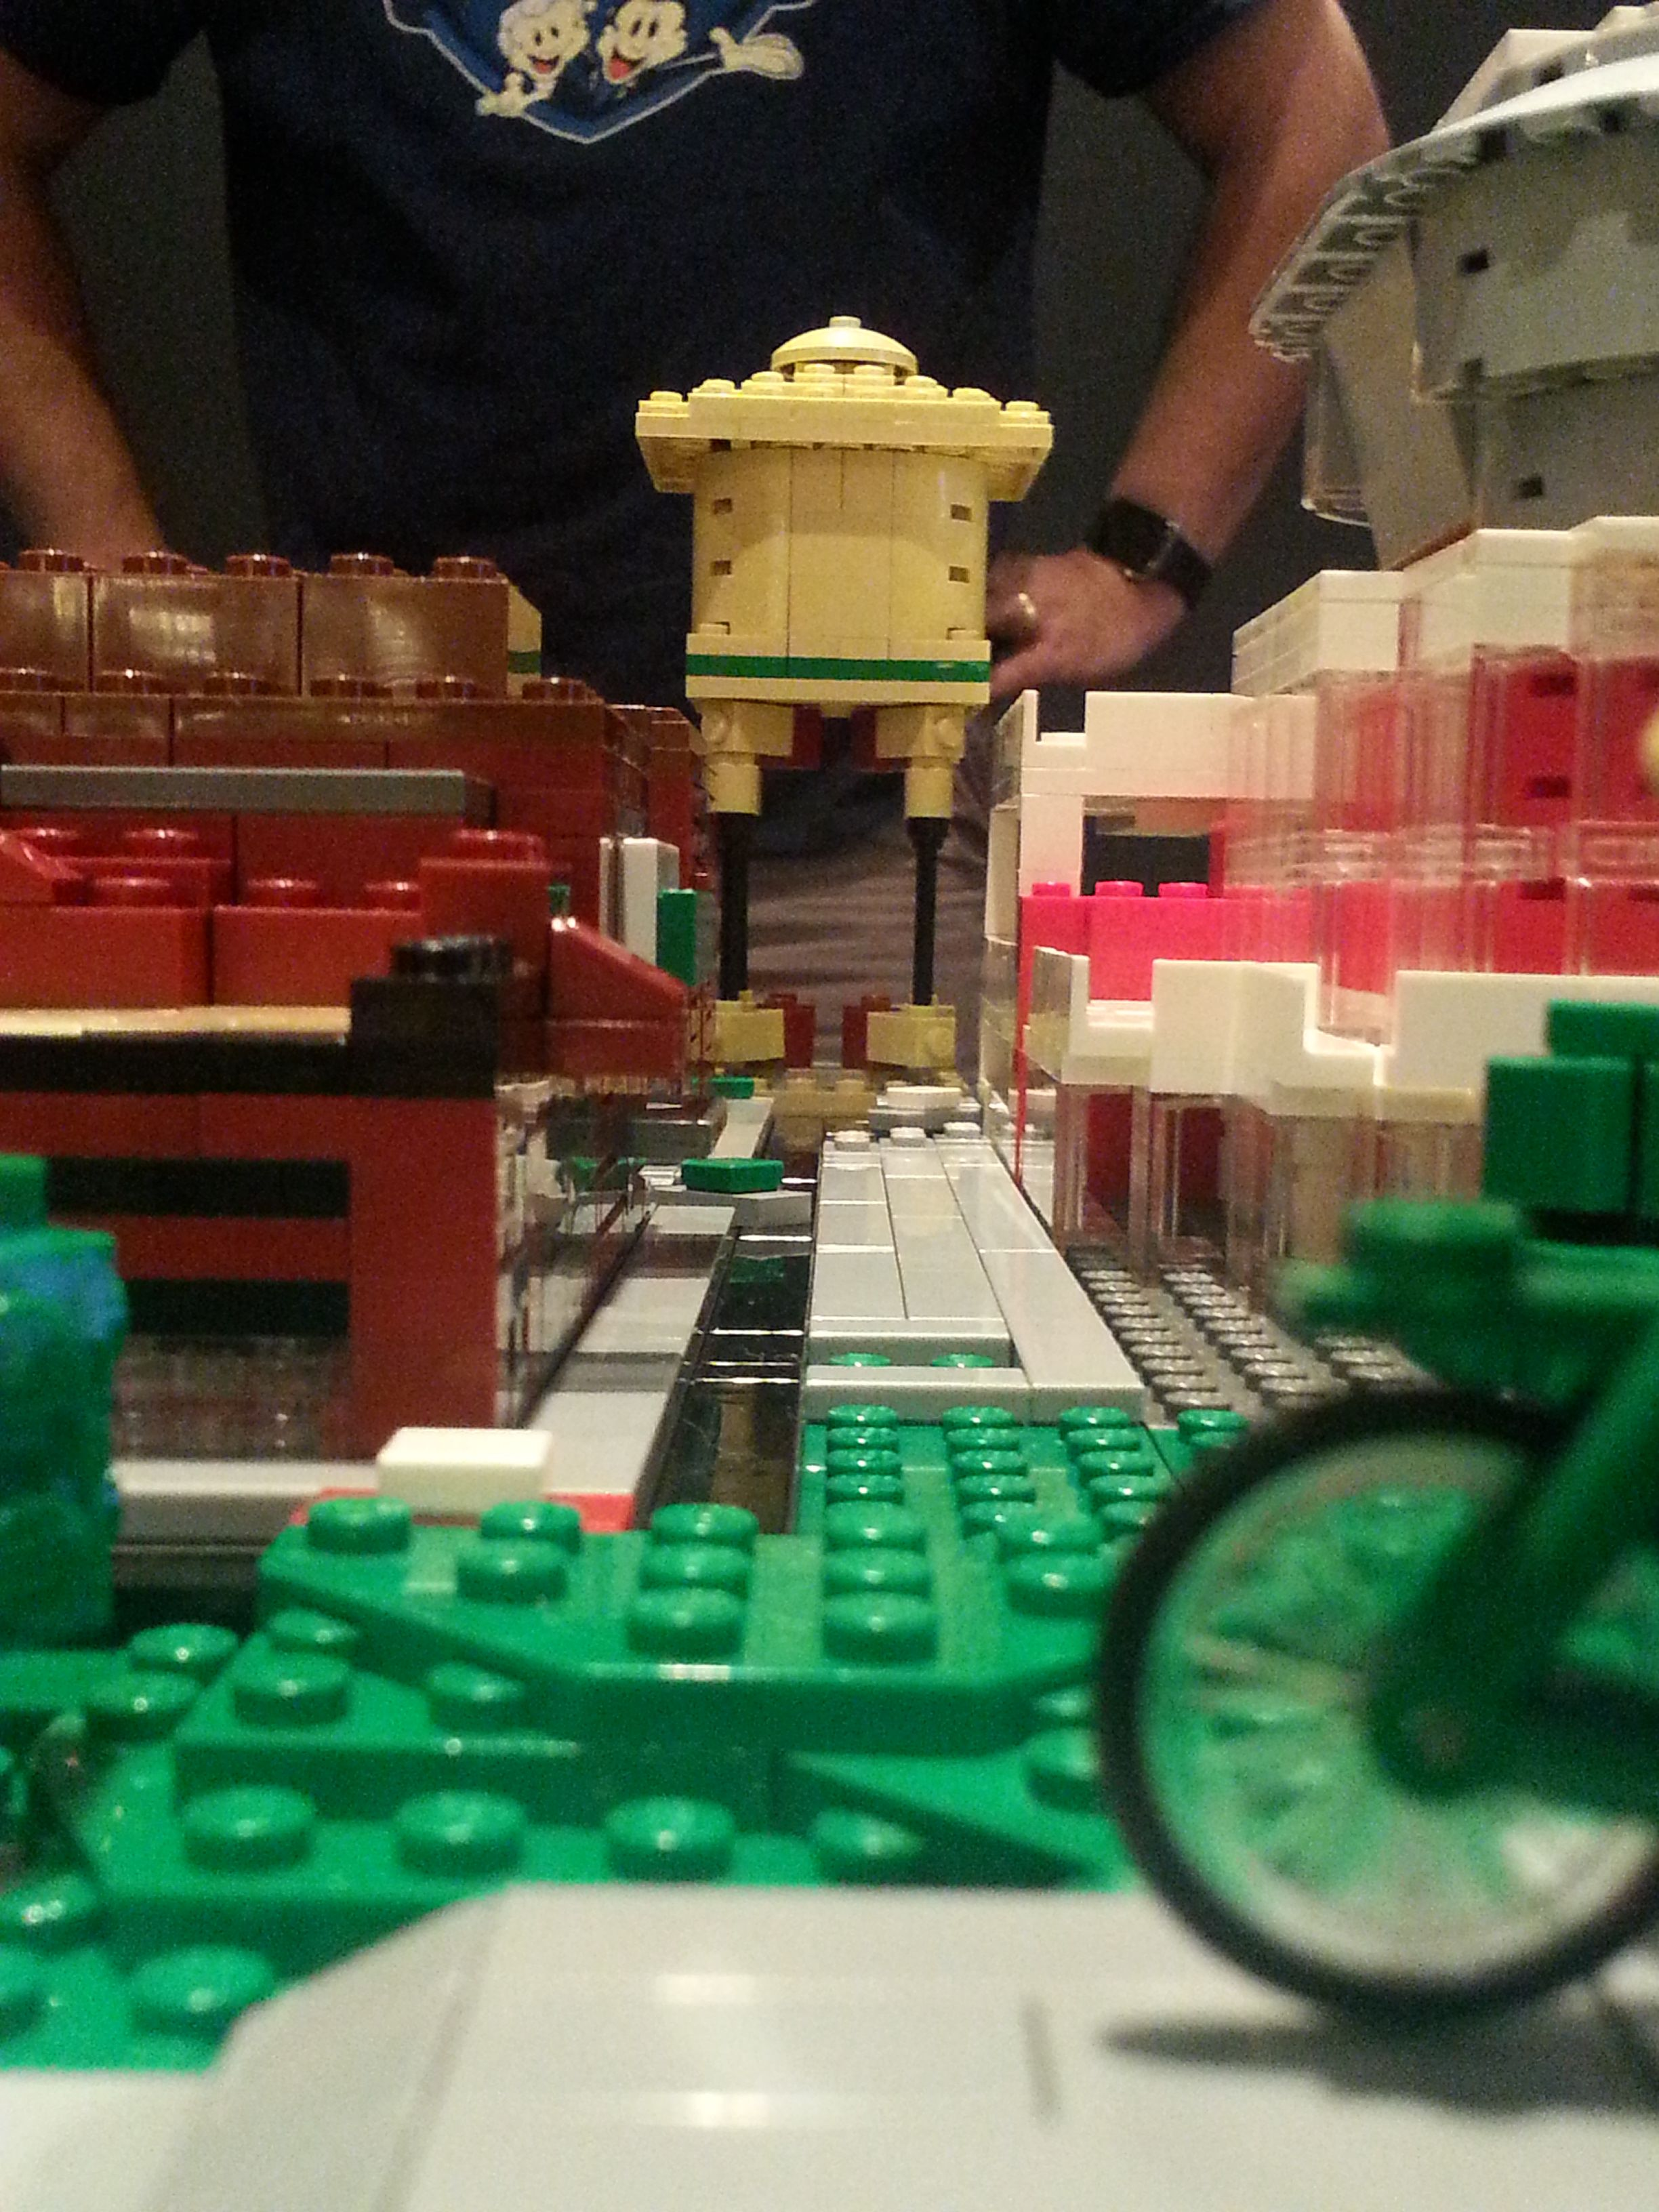 Lego union college build 2015 created by lolug union